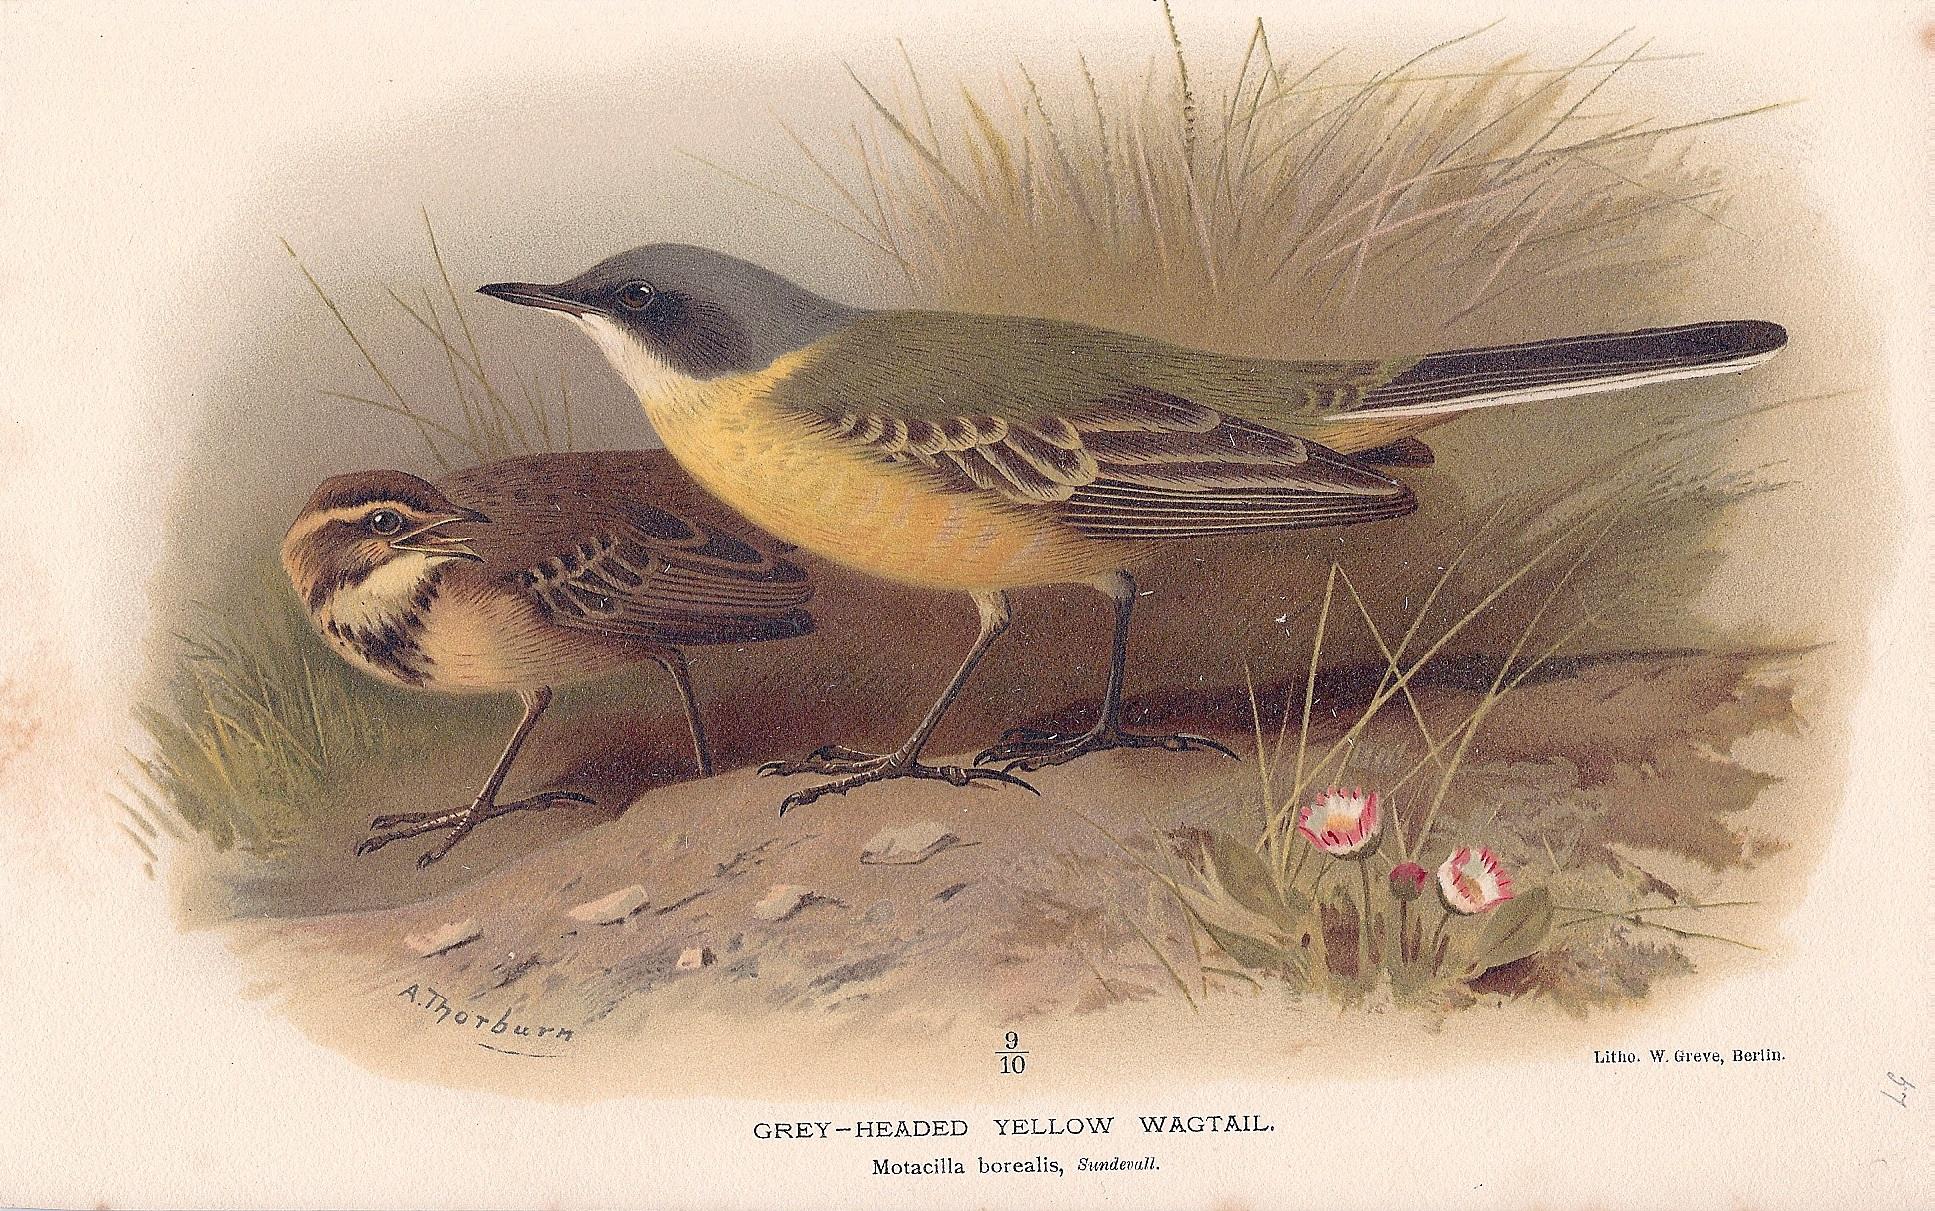 Grey-Headed Yellow Wagtail